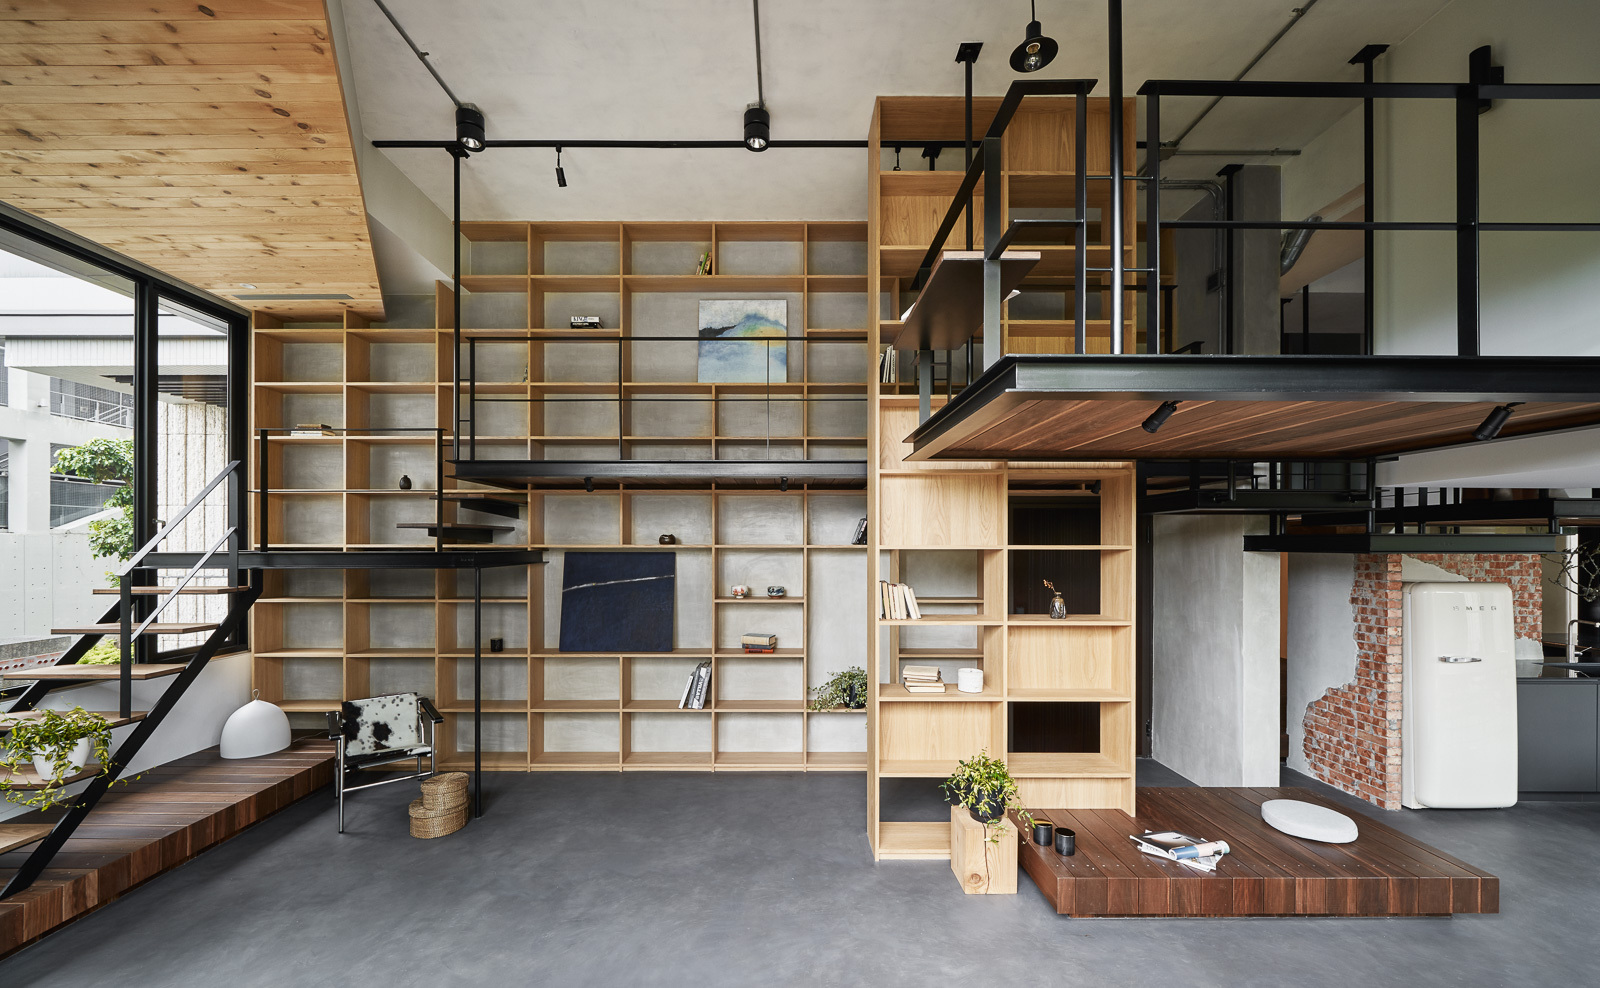 Gallery of Life in Tree House / Soar Design Studio - 1